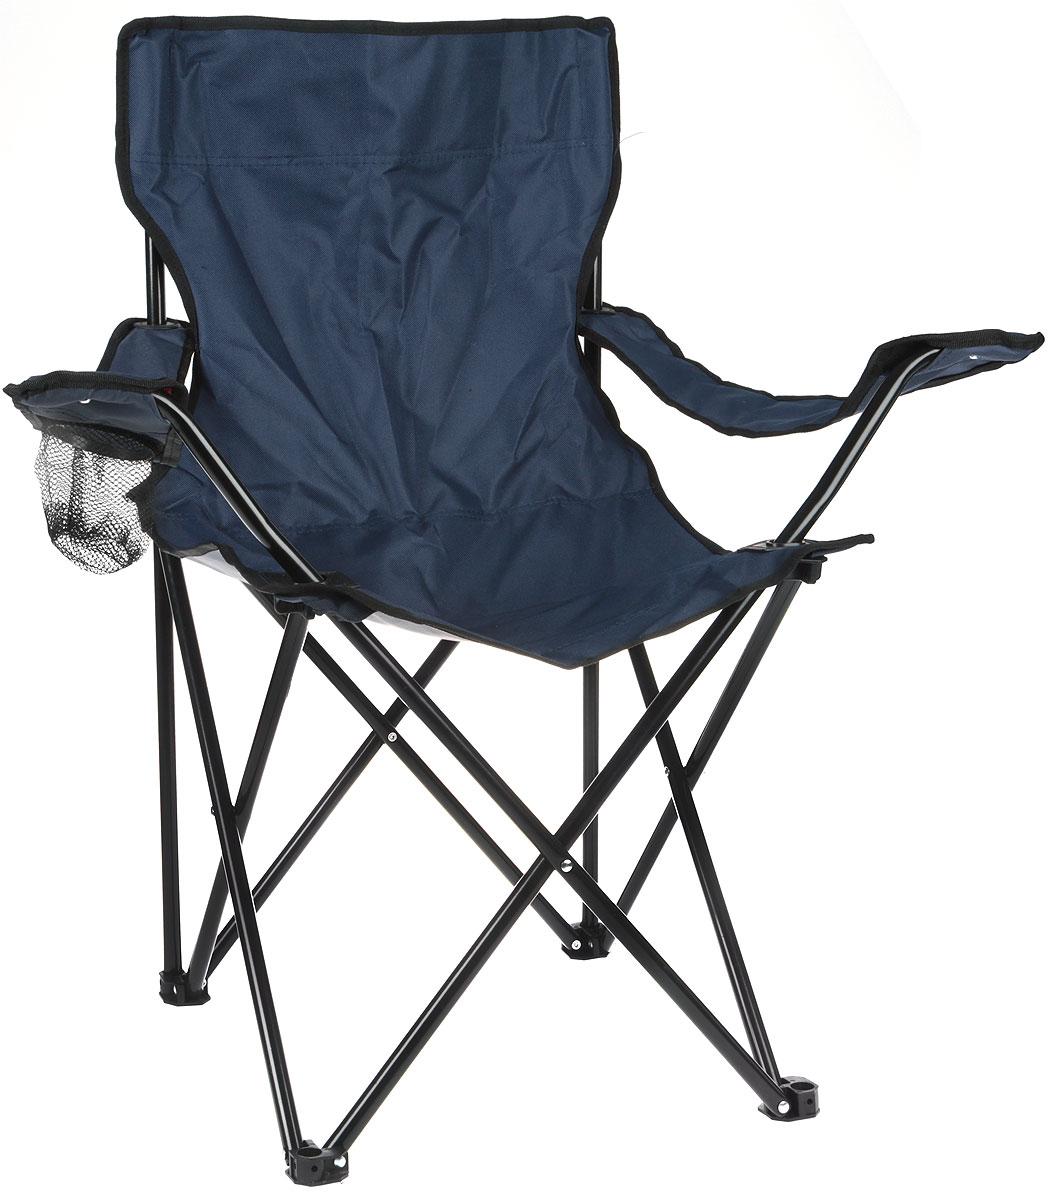 Кресло складное  Wildman , с подлокотником, цвет: темно-синий, 77 х 50 х 80 см -